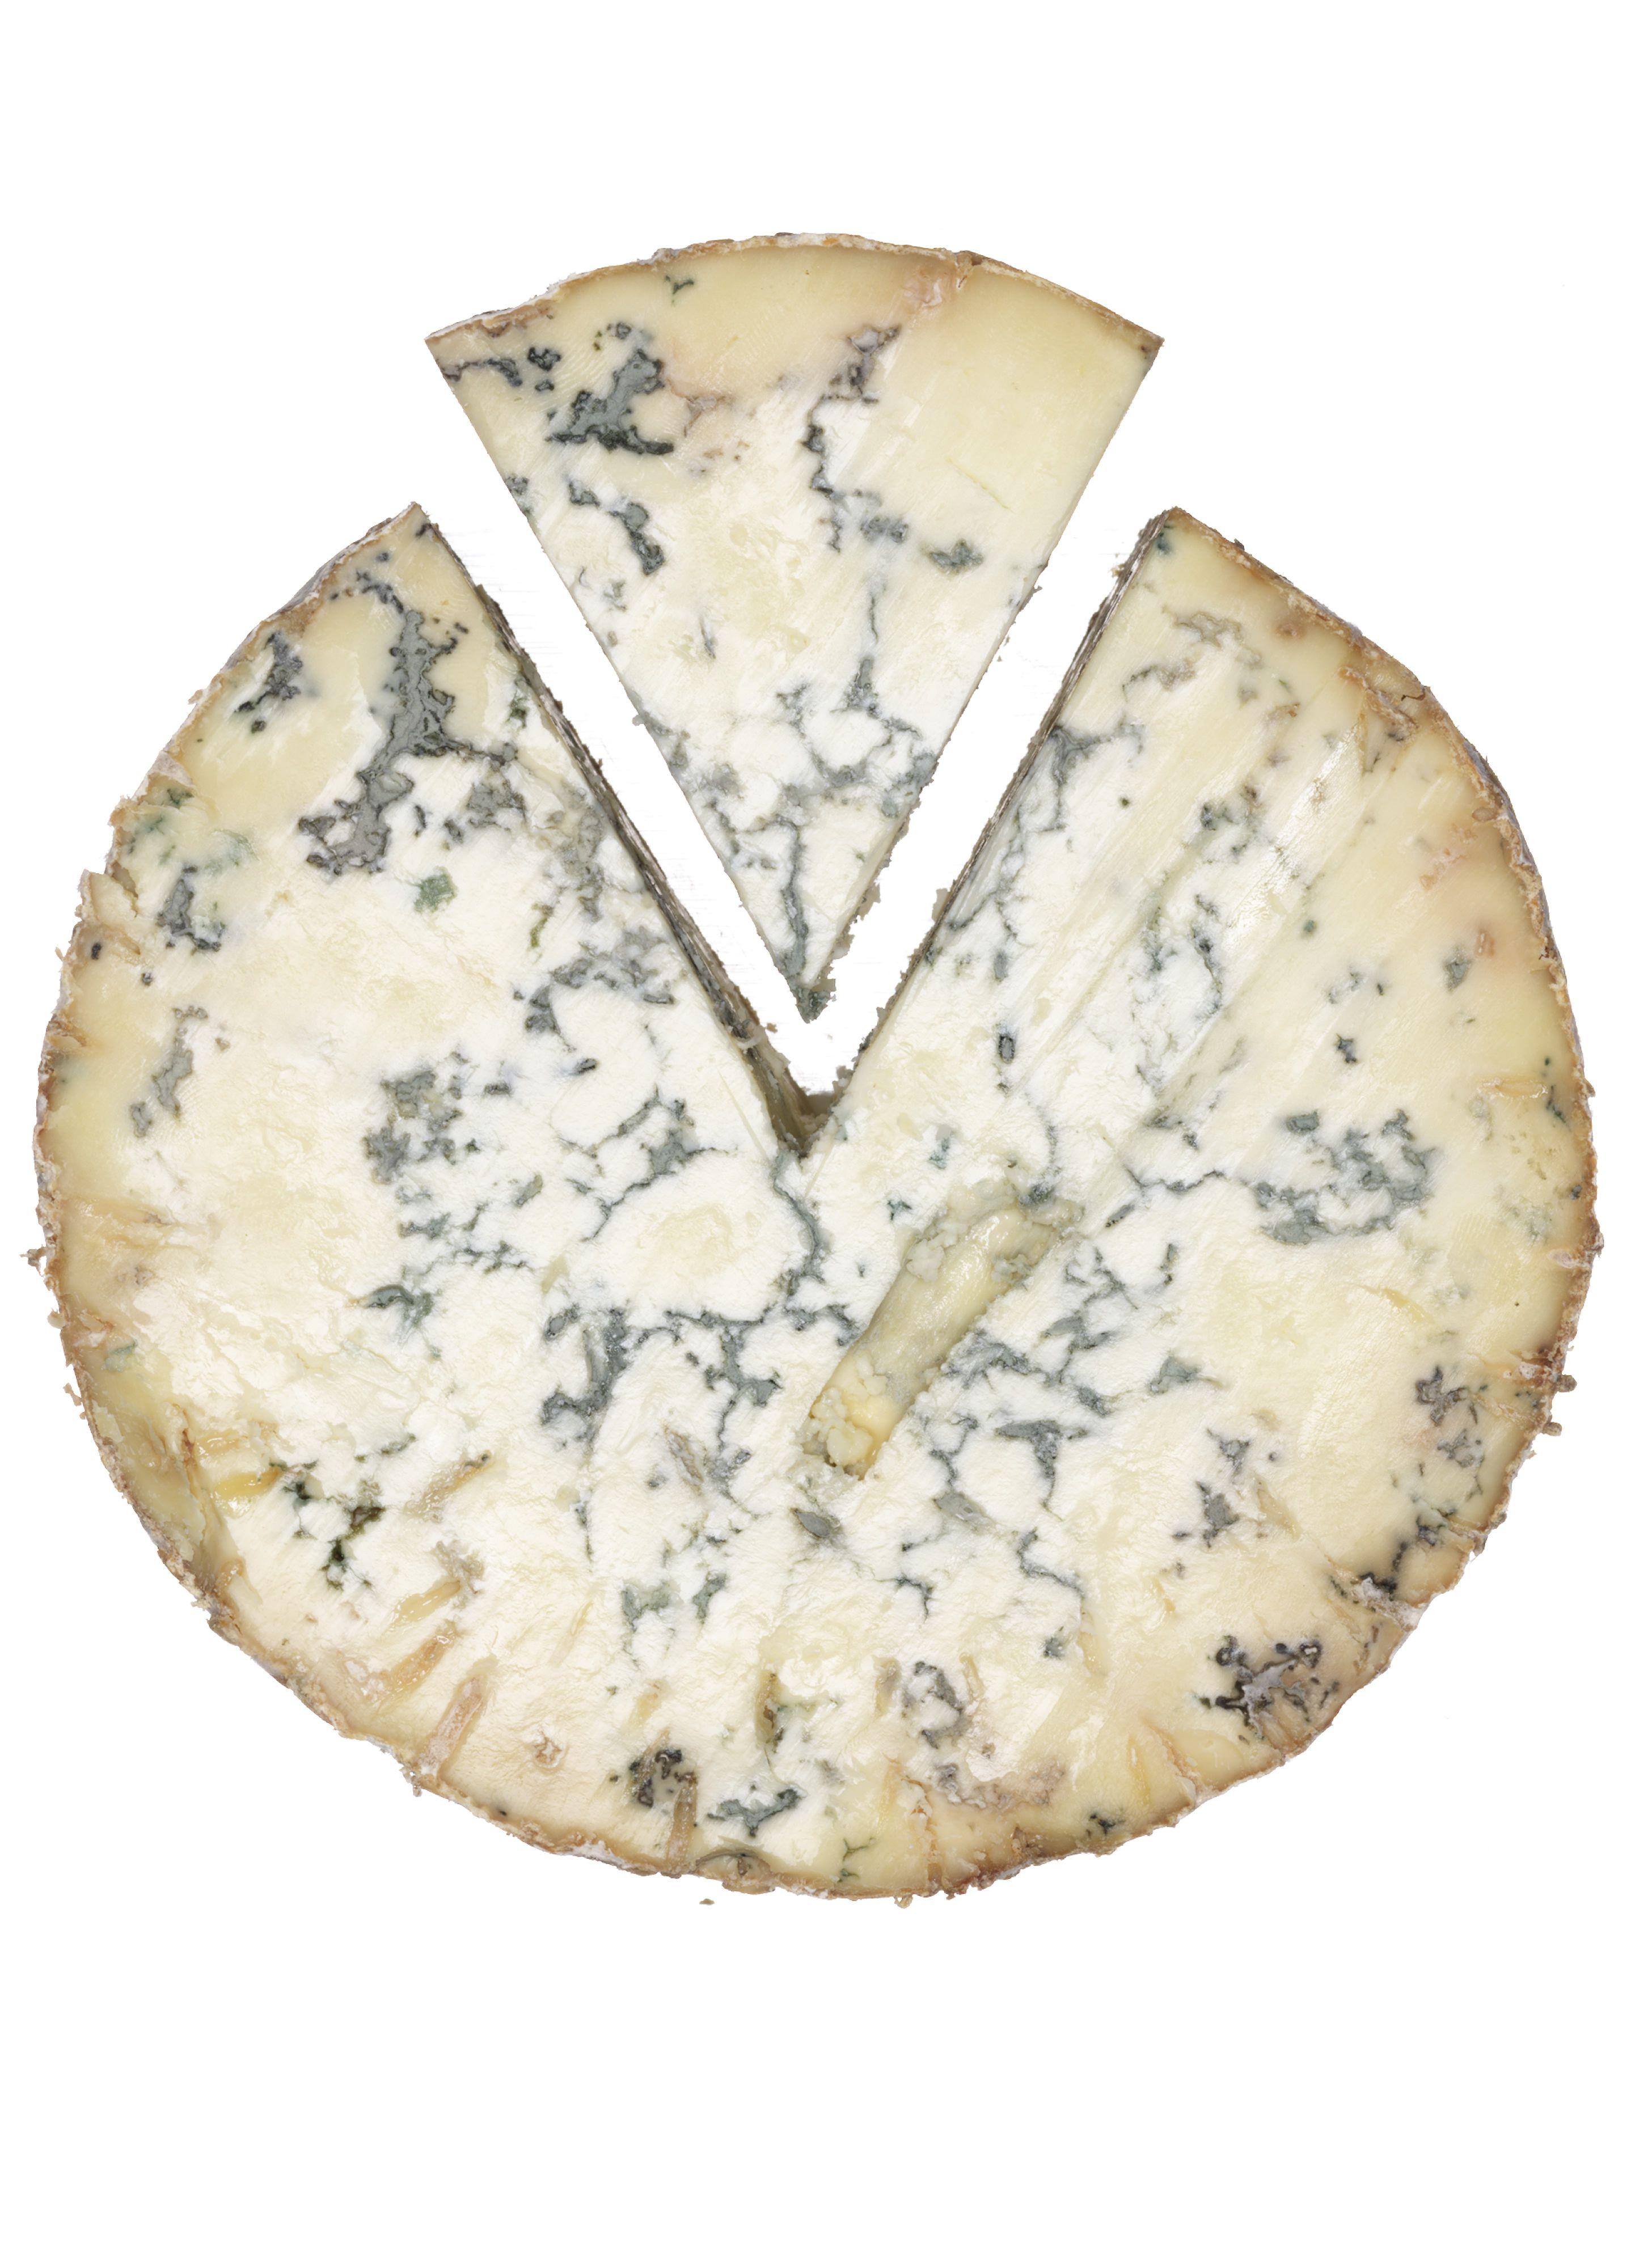 Stilton cheese, close up